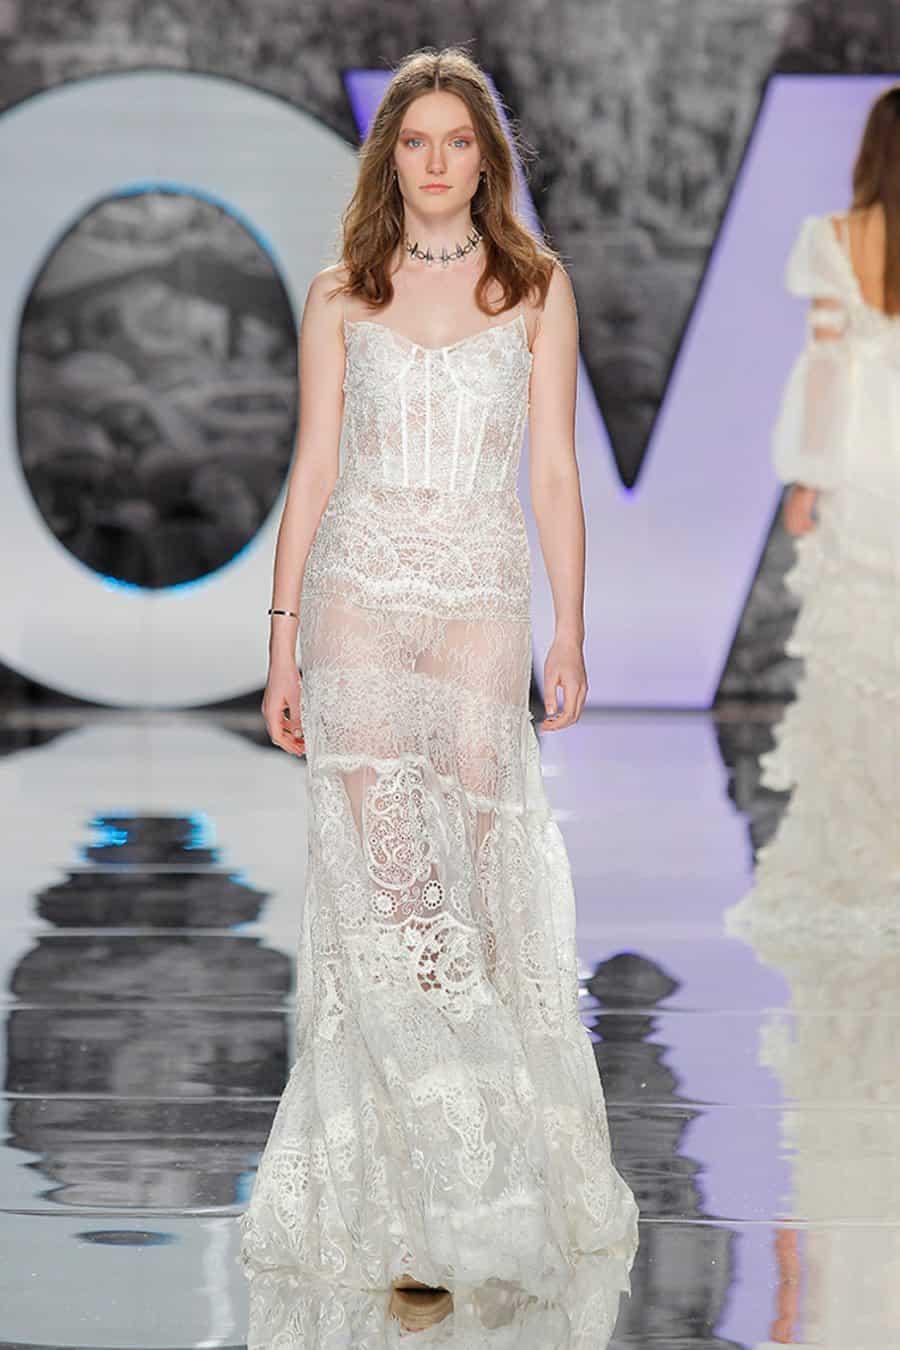 yolancris-weddingdress-bride-boho-chic-folk-wedding-dress-couture-fashion-desing-bohodress-67